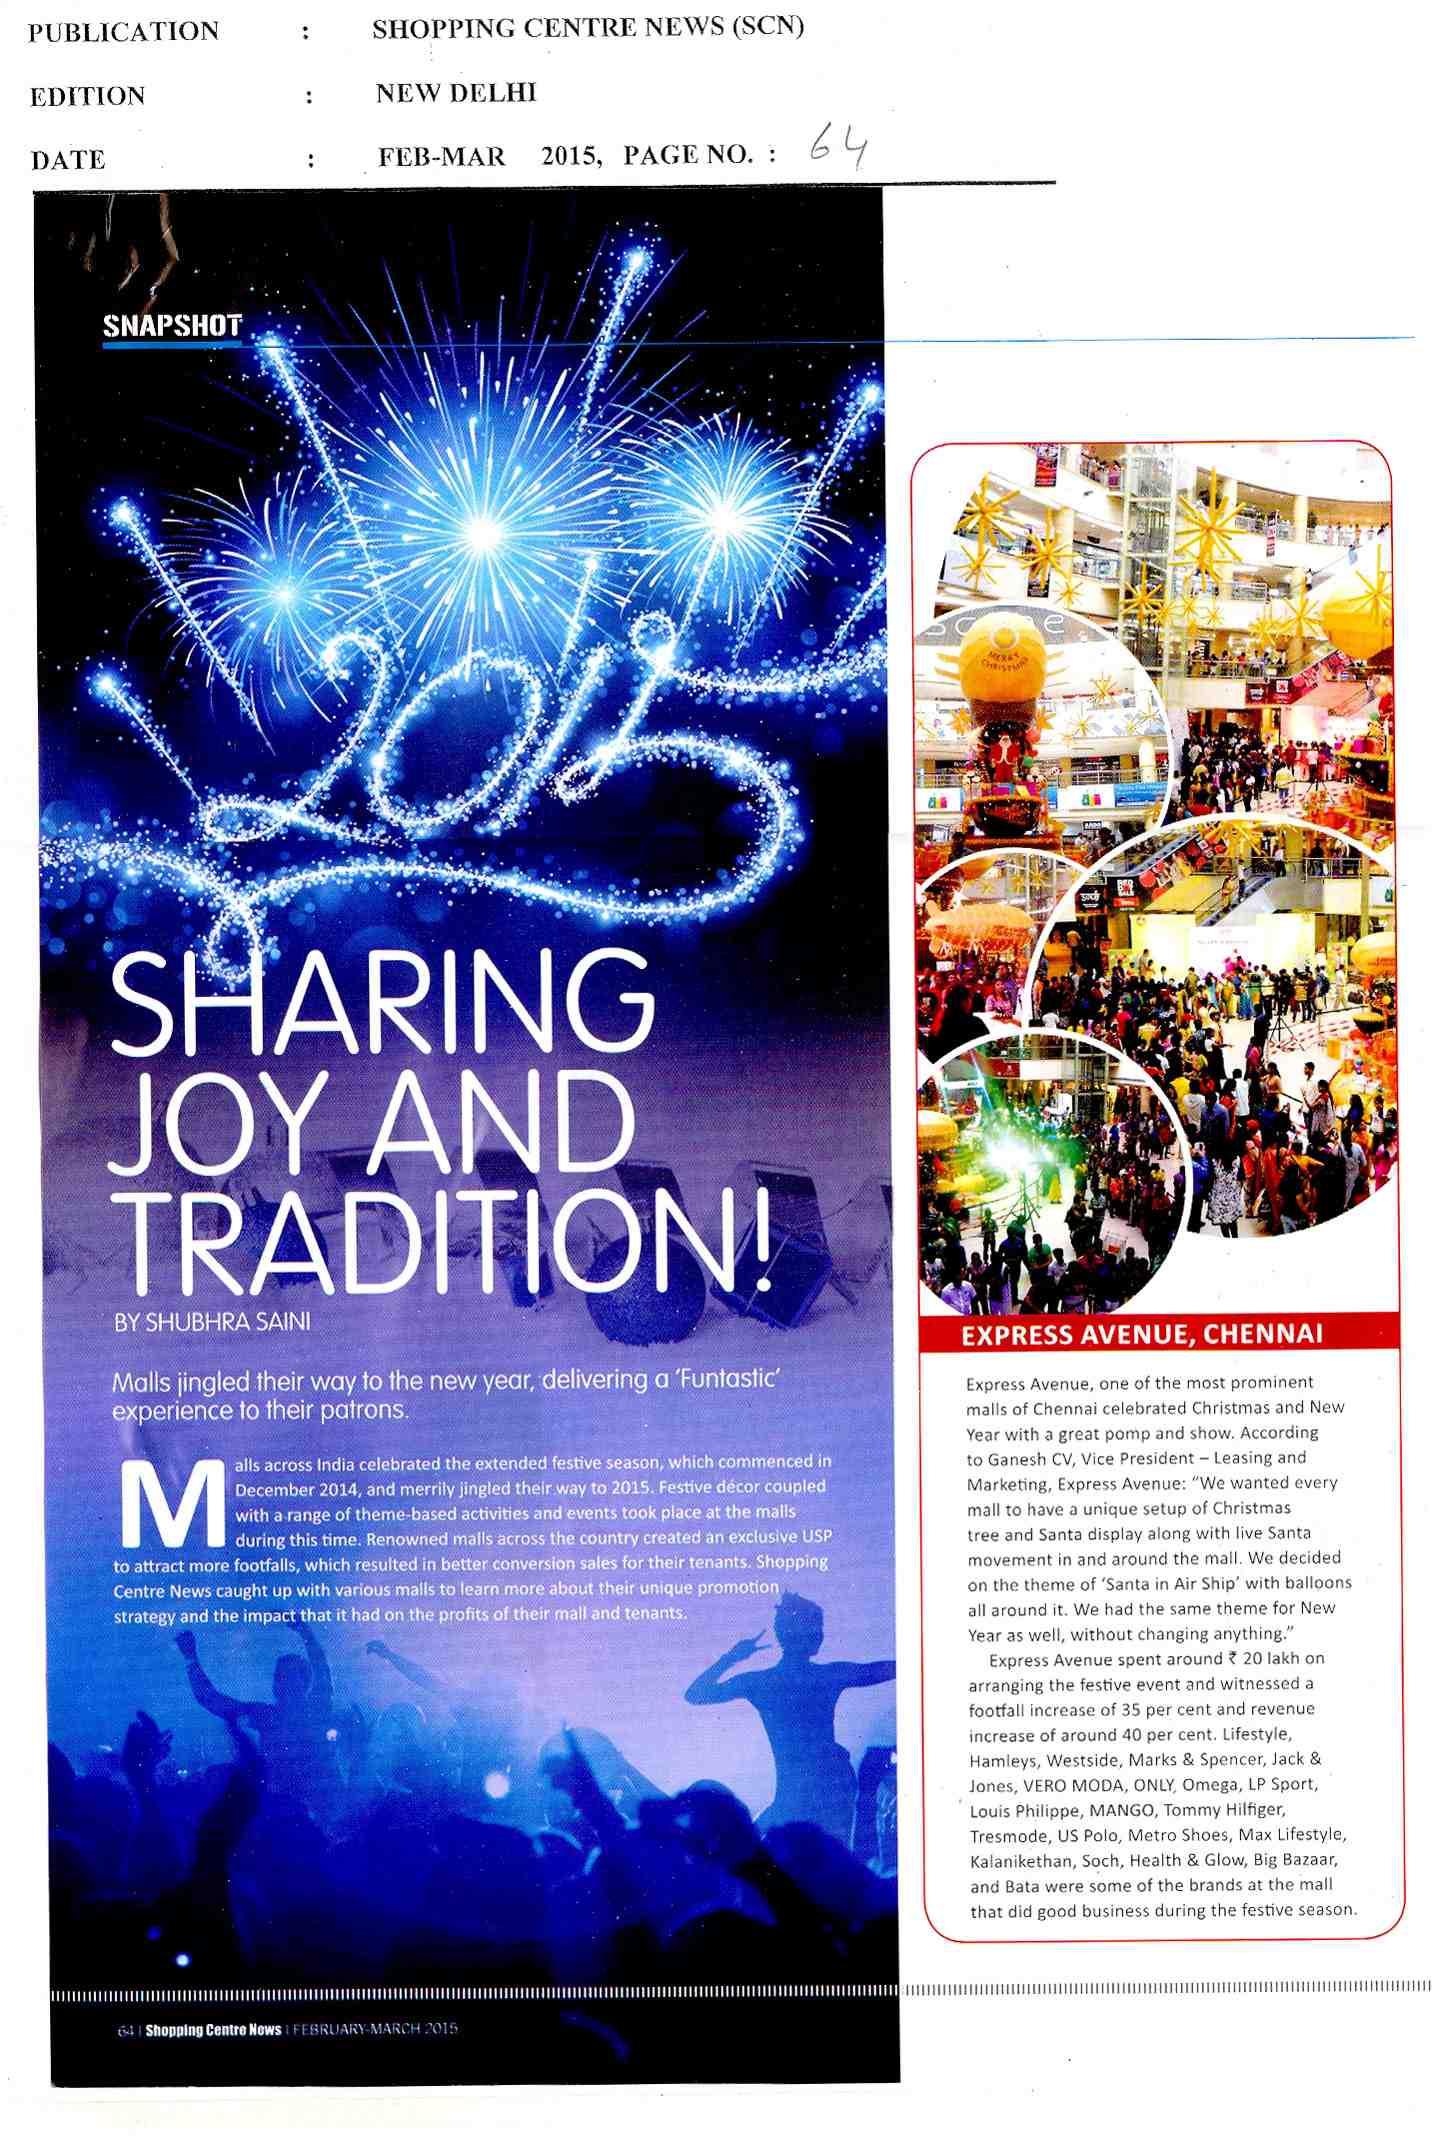 Sharing Joy And tradition!